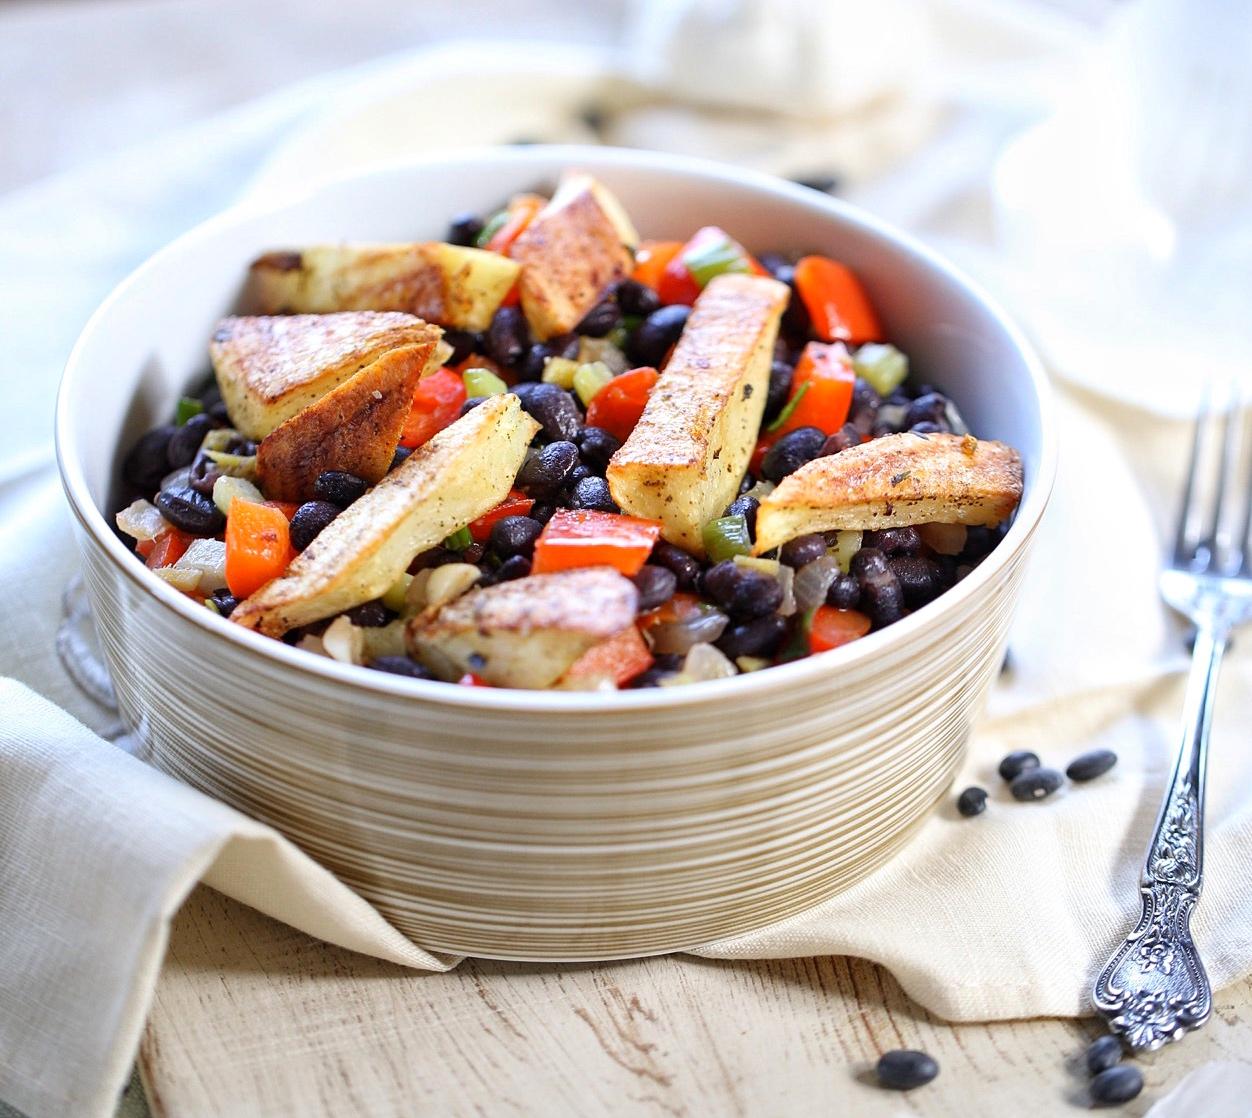 Spicy black bean bowl